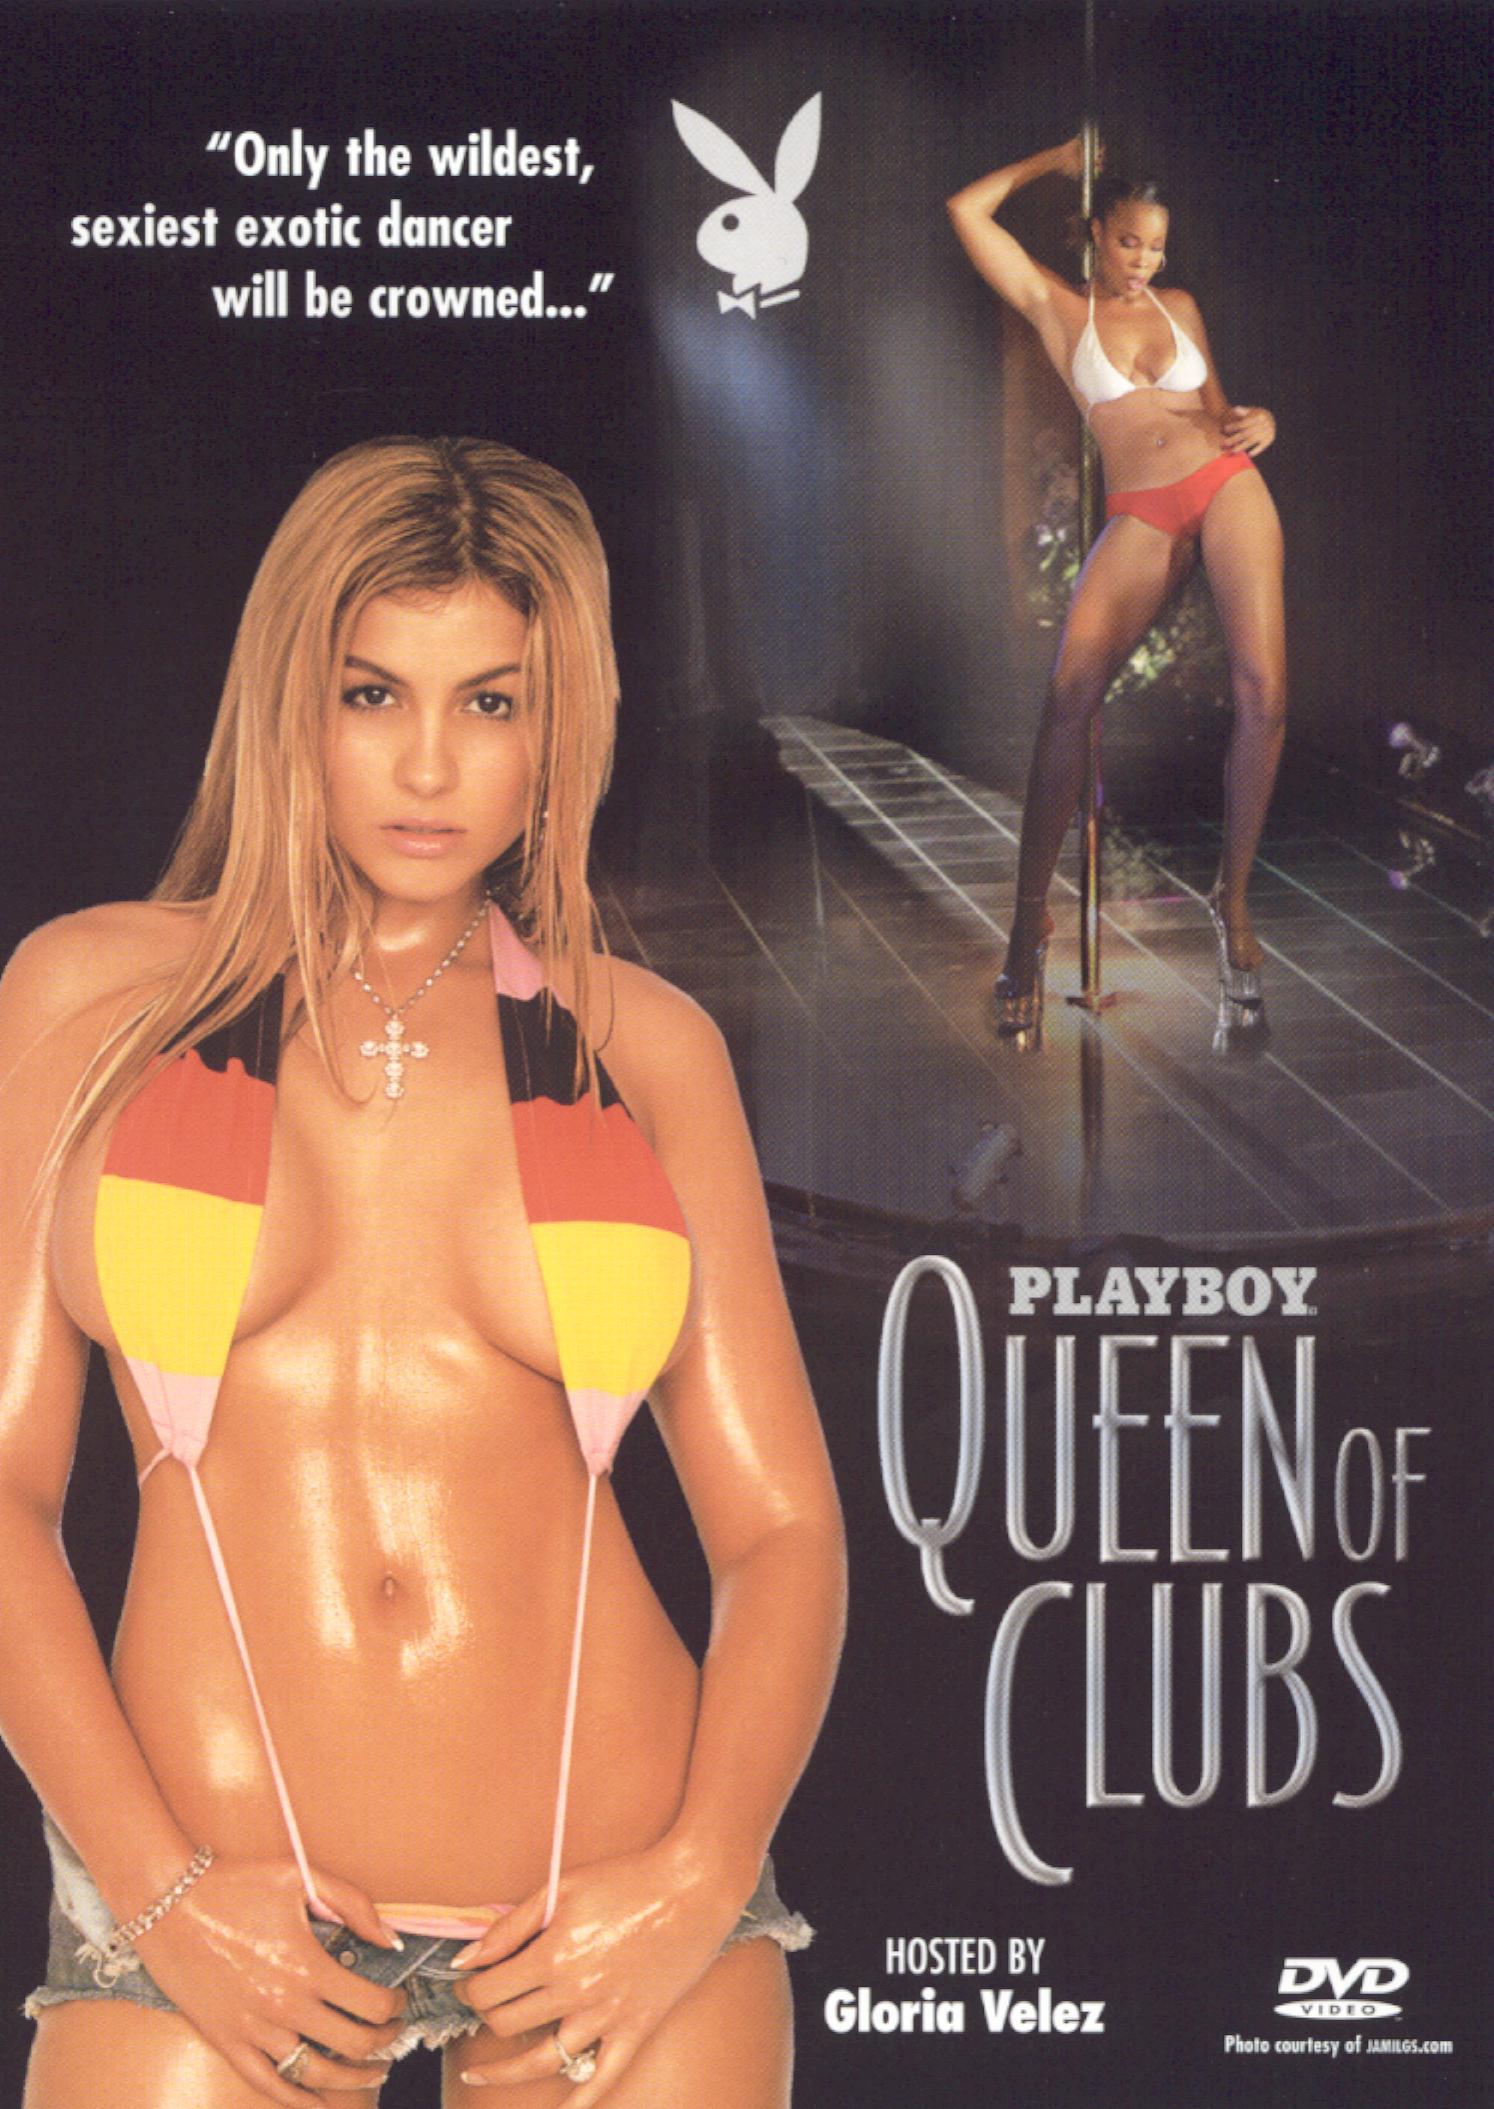 Playboy: Queen Of Clubs